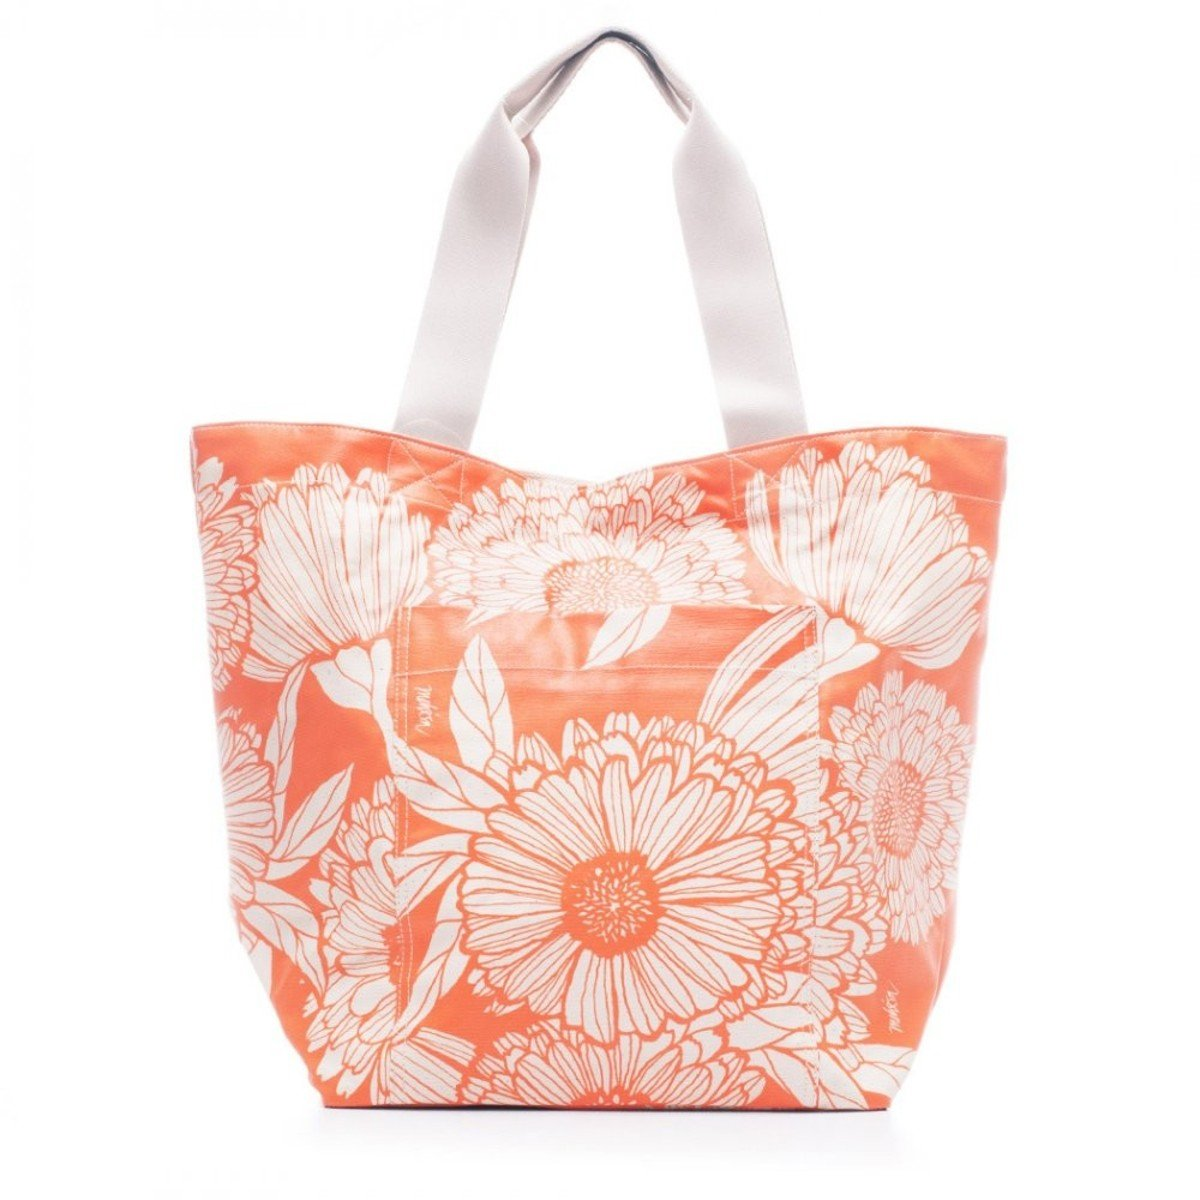 沙灘袋 - Orange Oriental